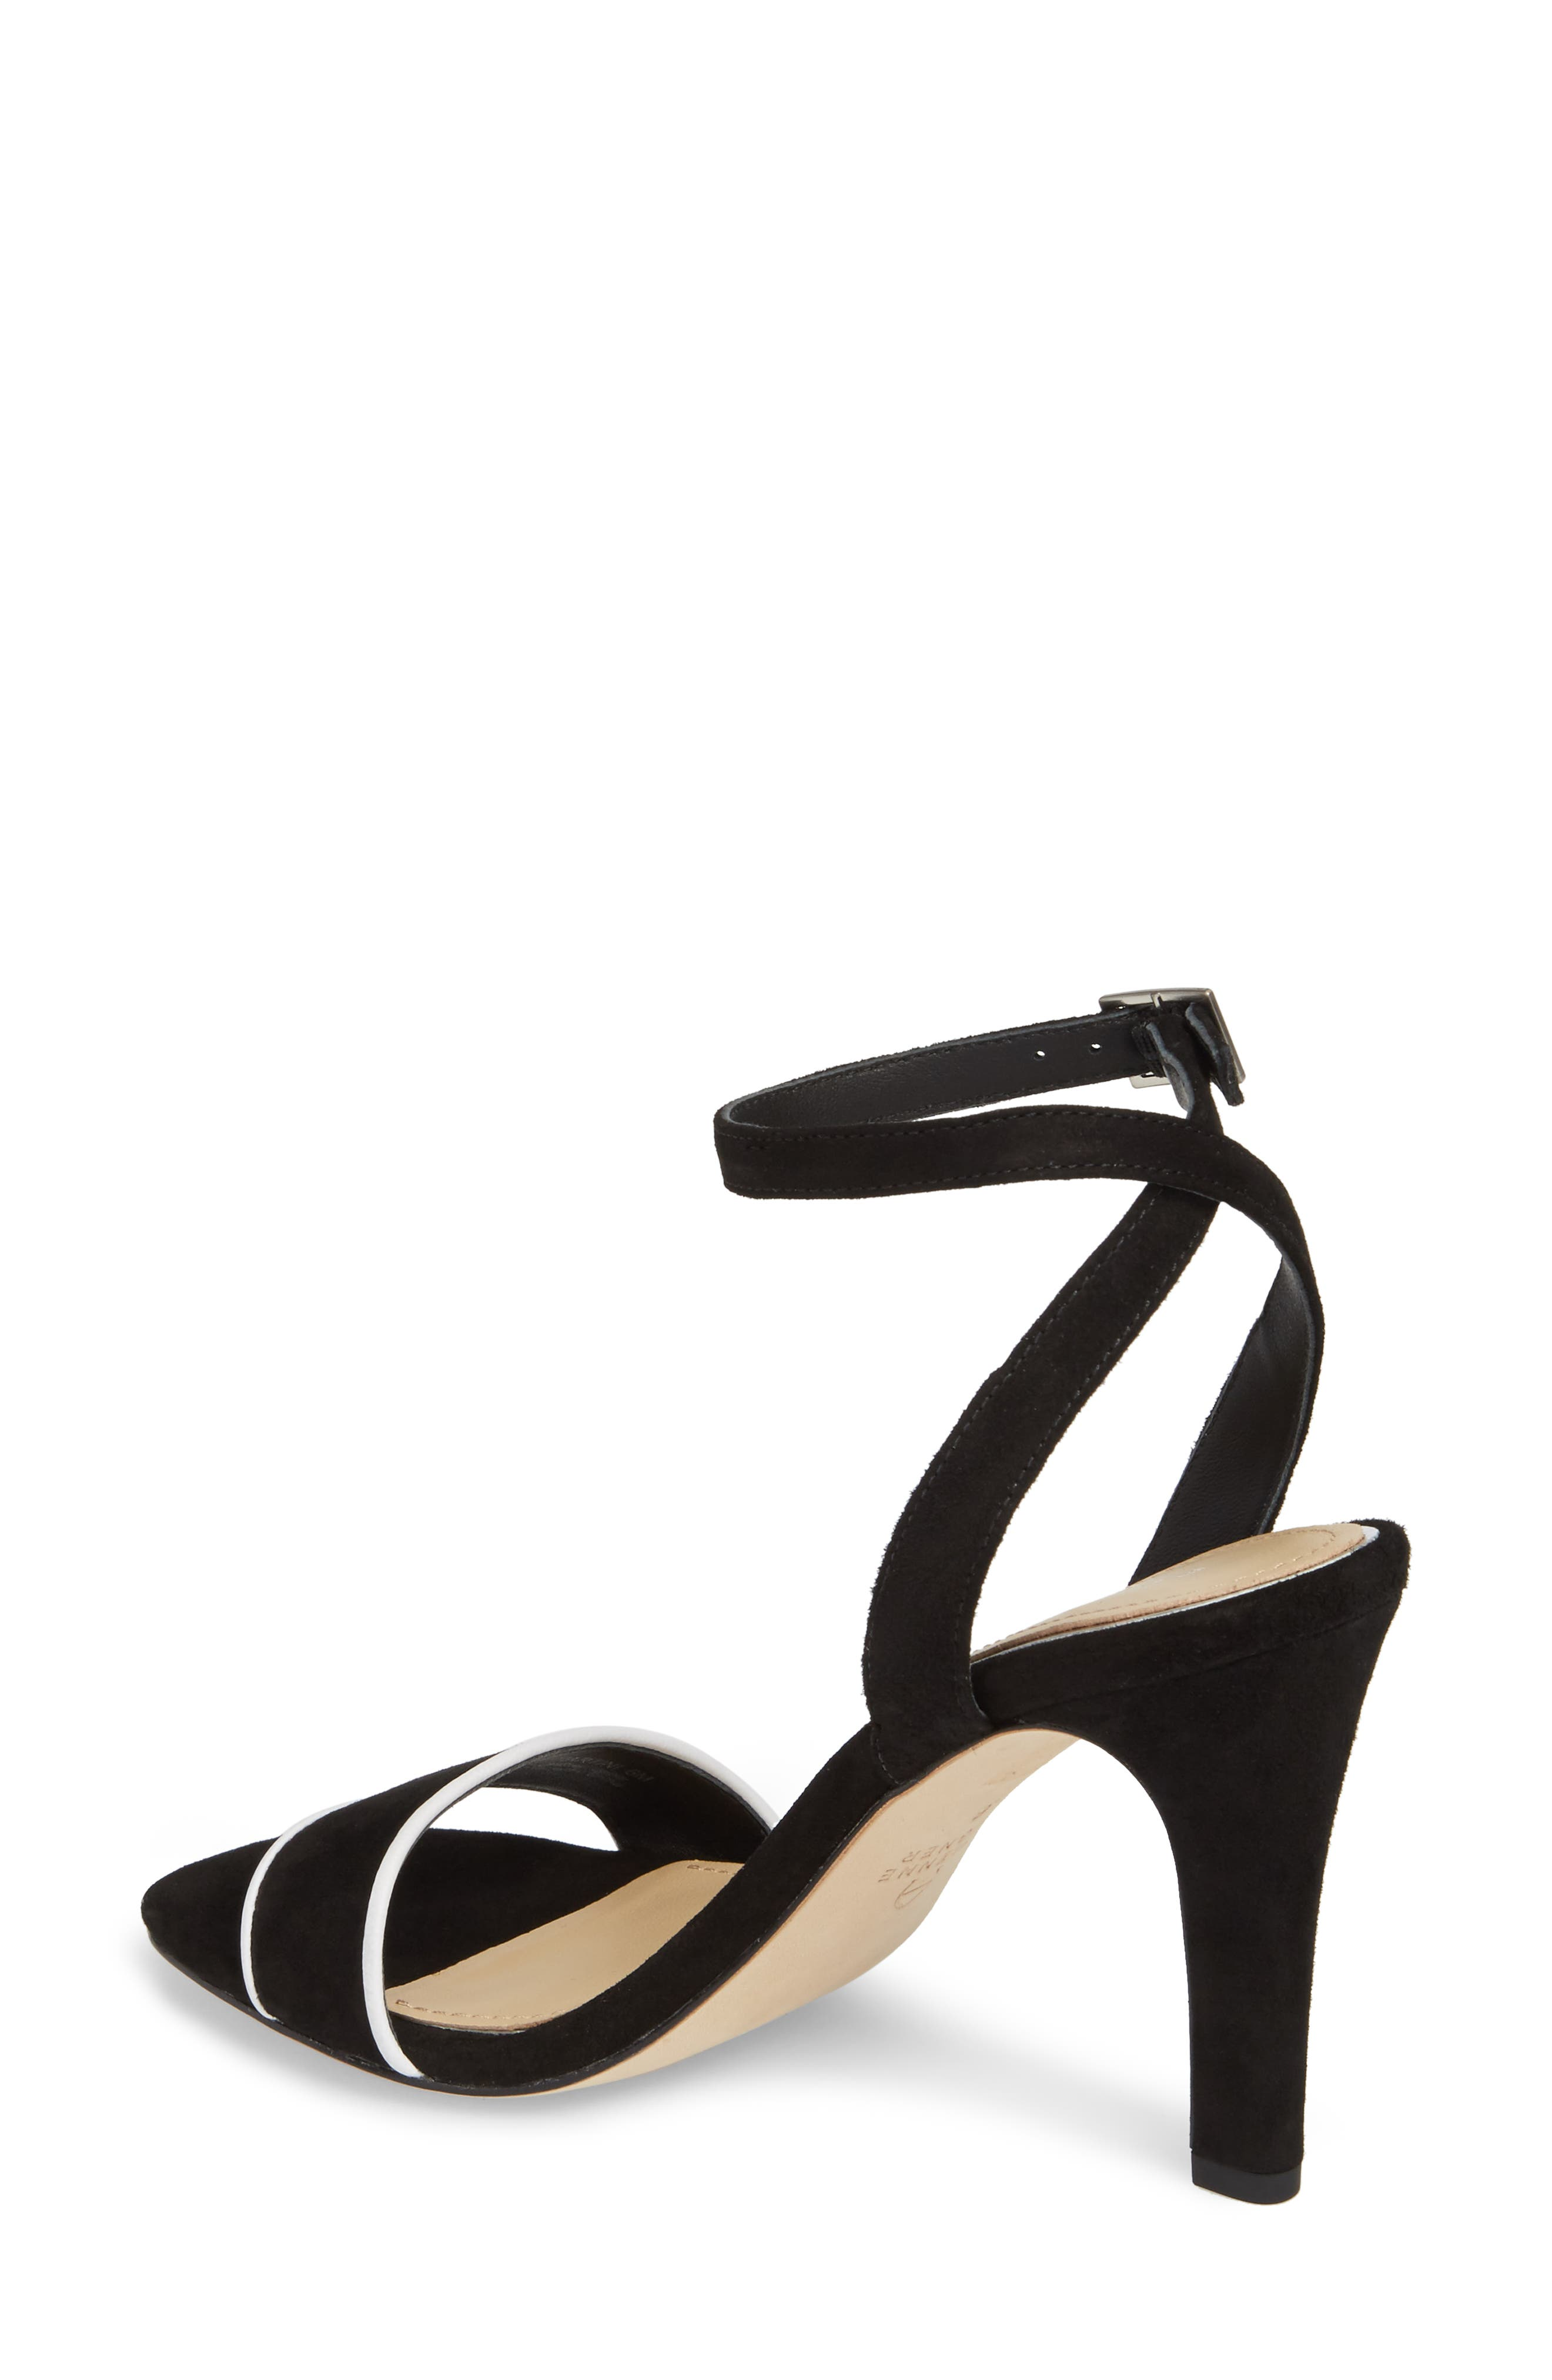 Martini Sandal,                             Alternate thumbnail 2, color,                             BLACK/ WHITE SUEDE